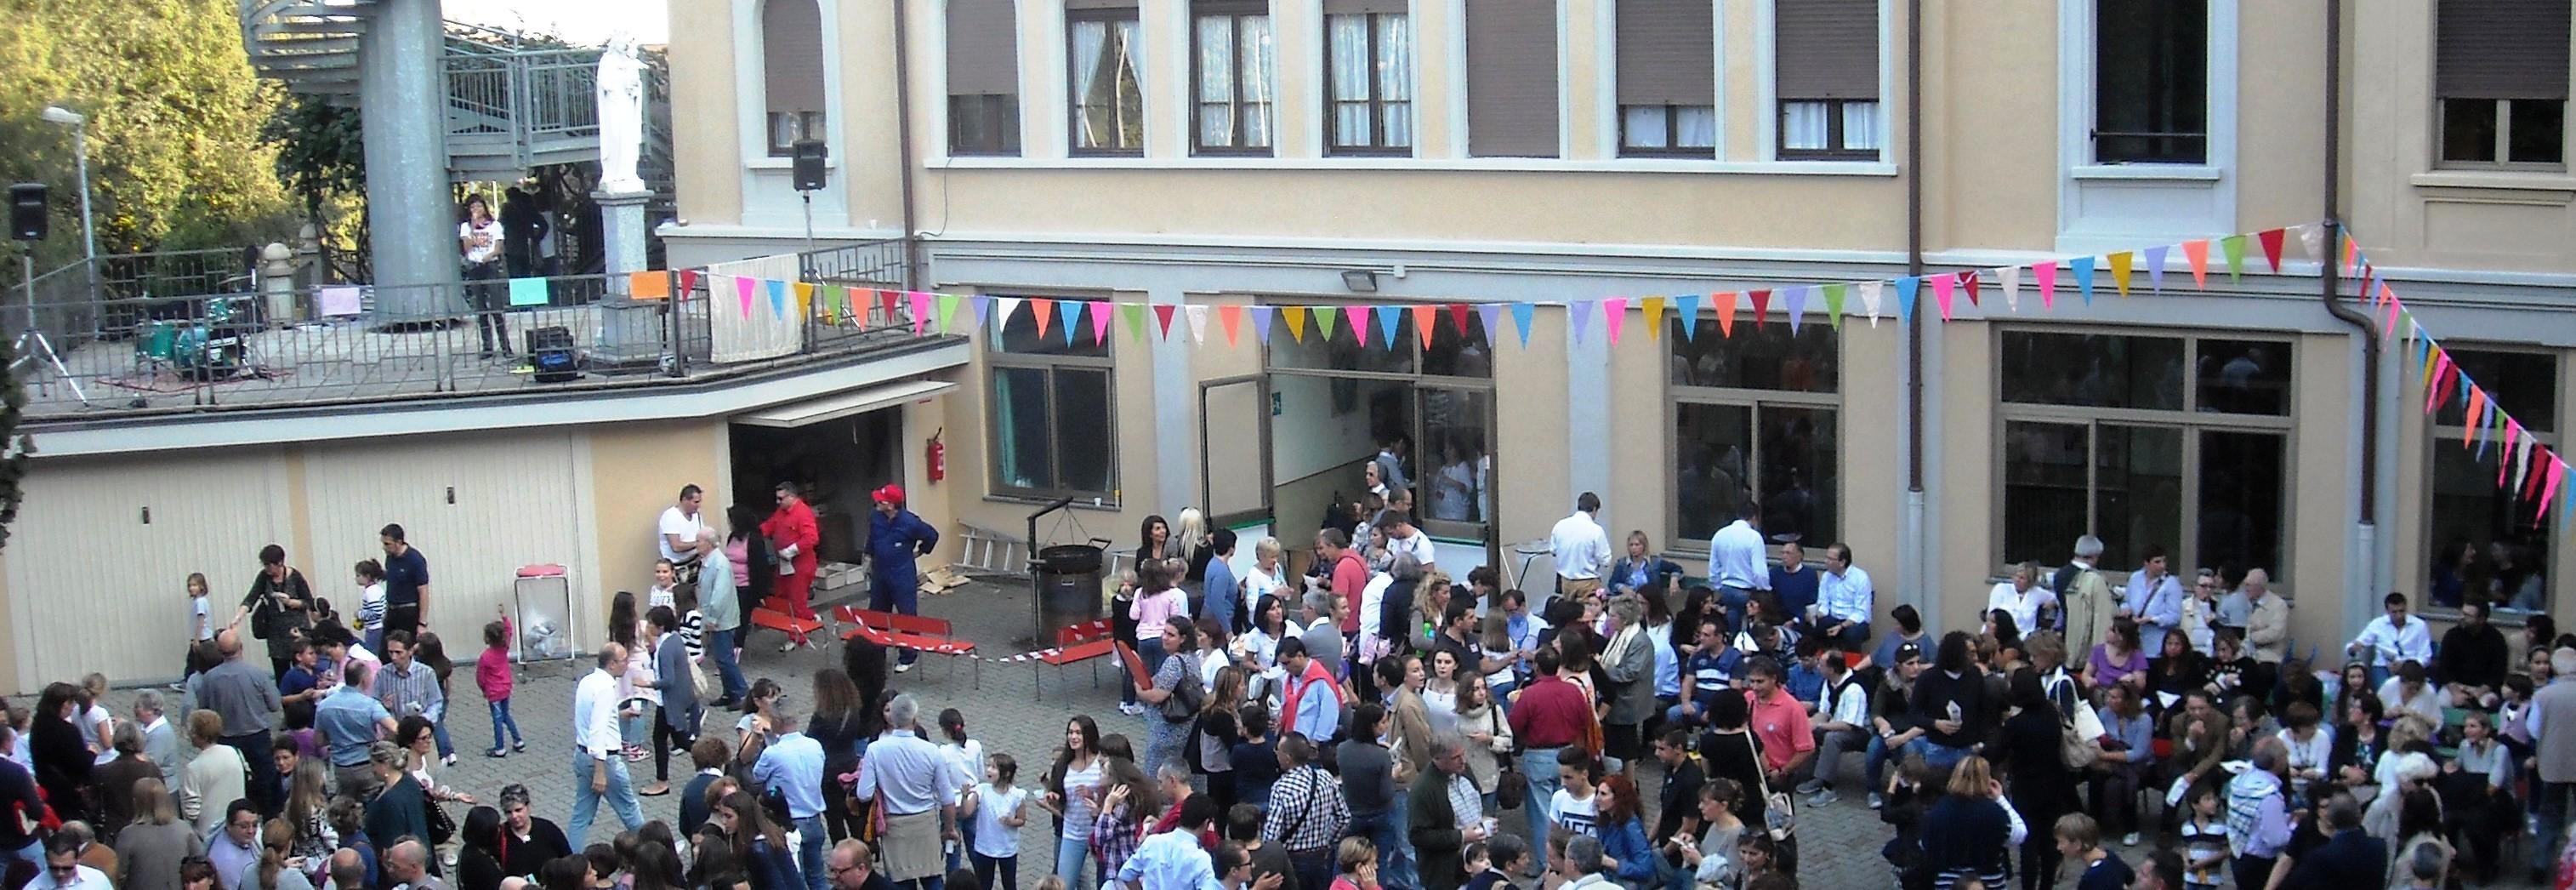 Novara: festa missionaria all'Immacolata